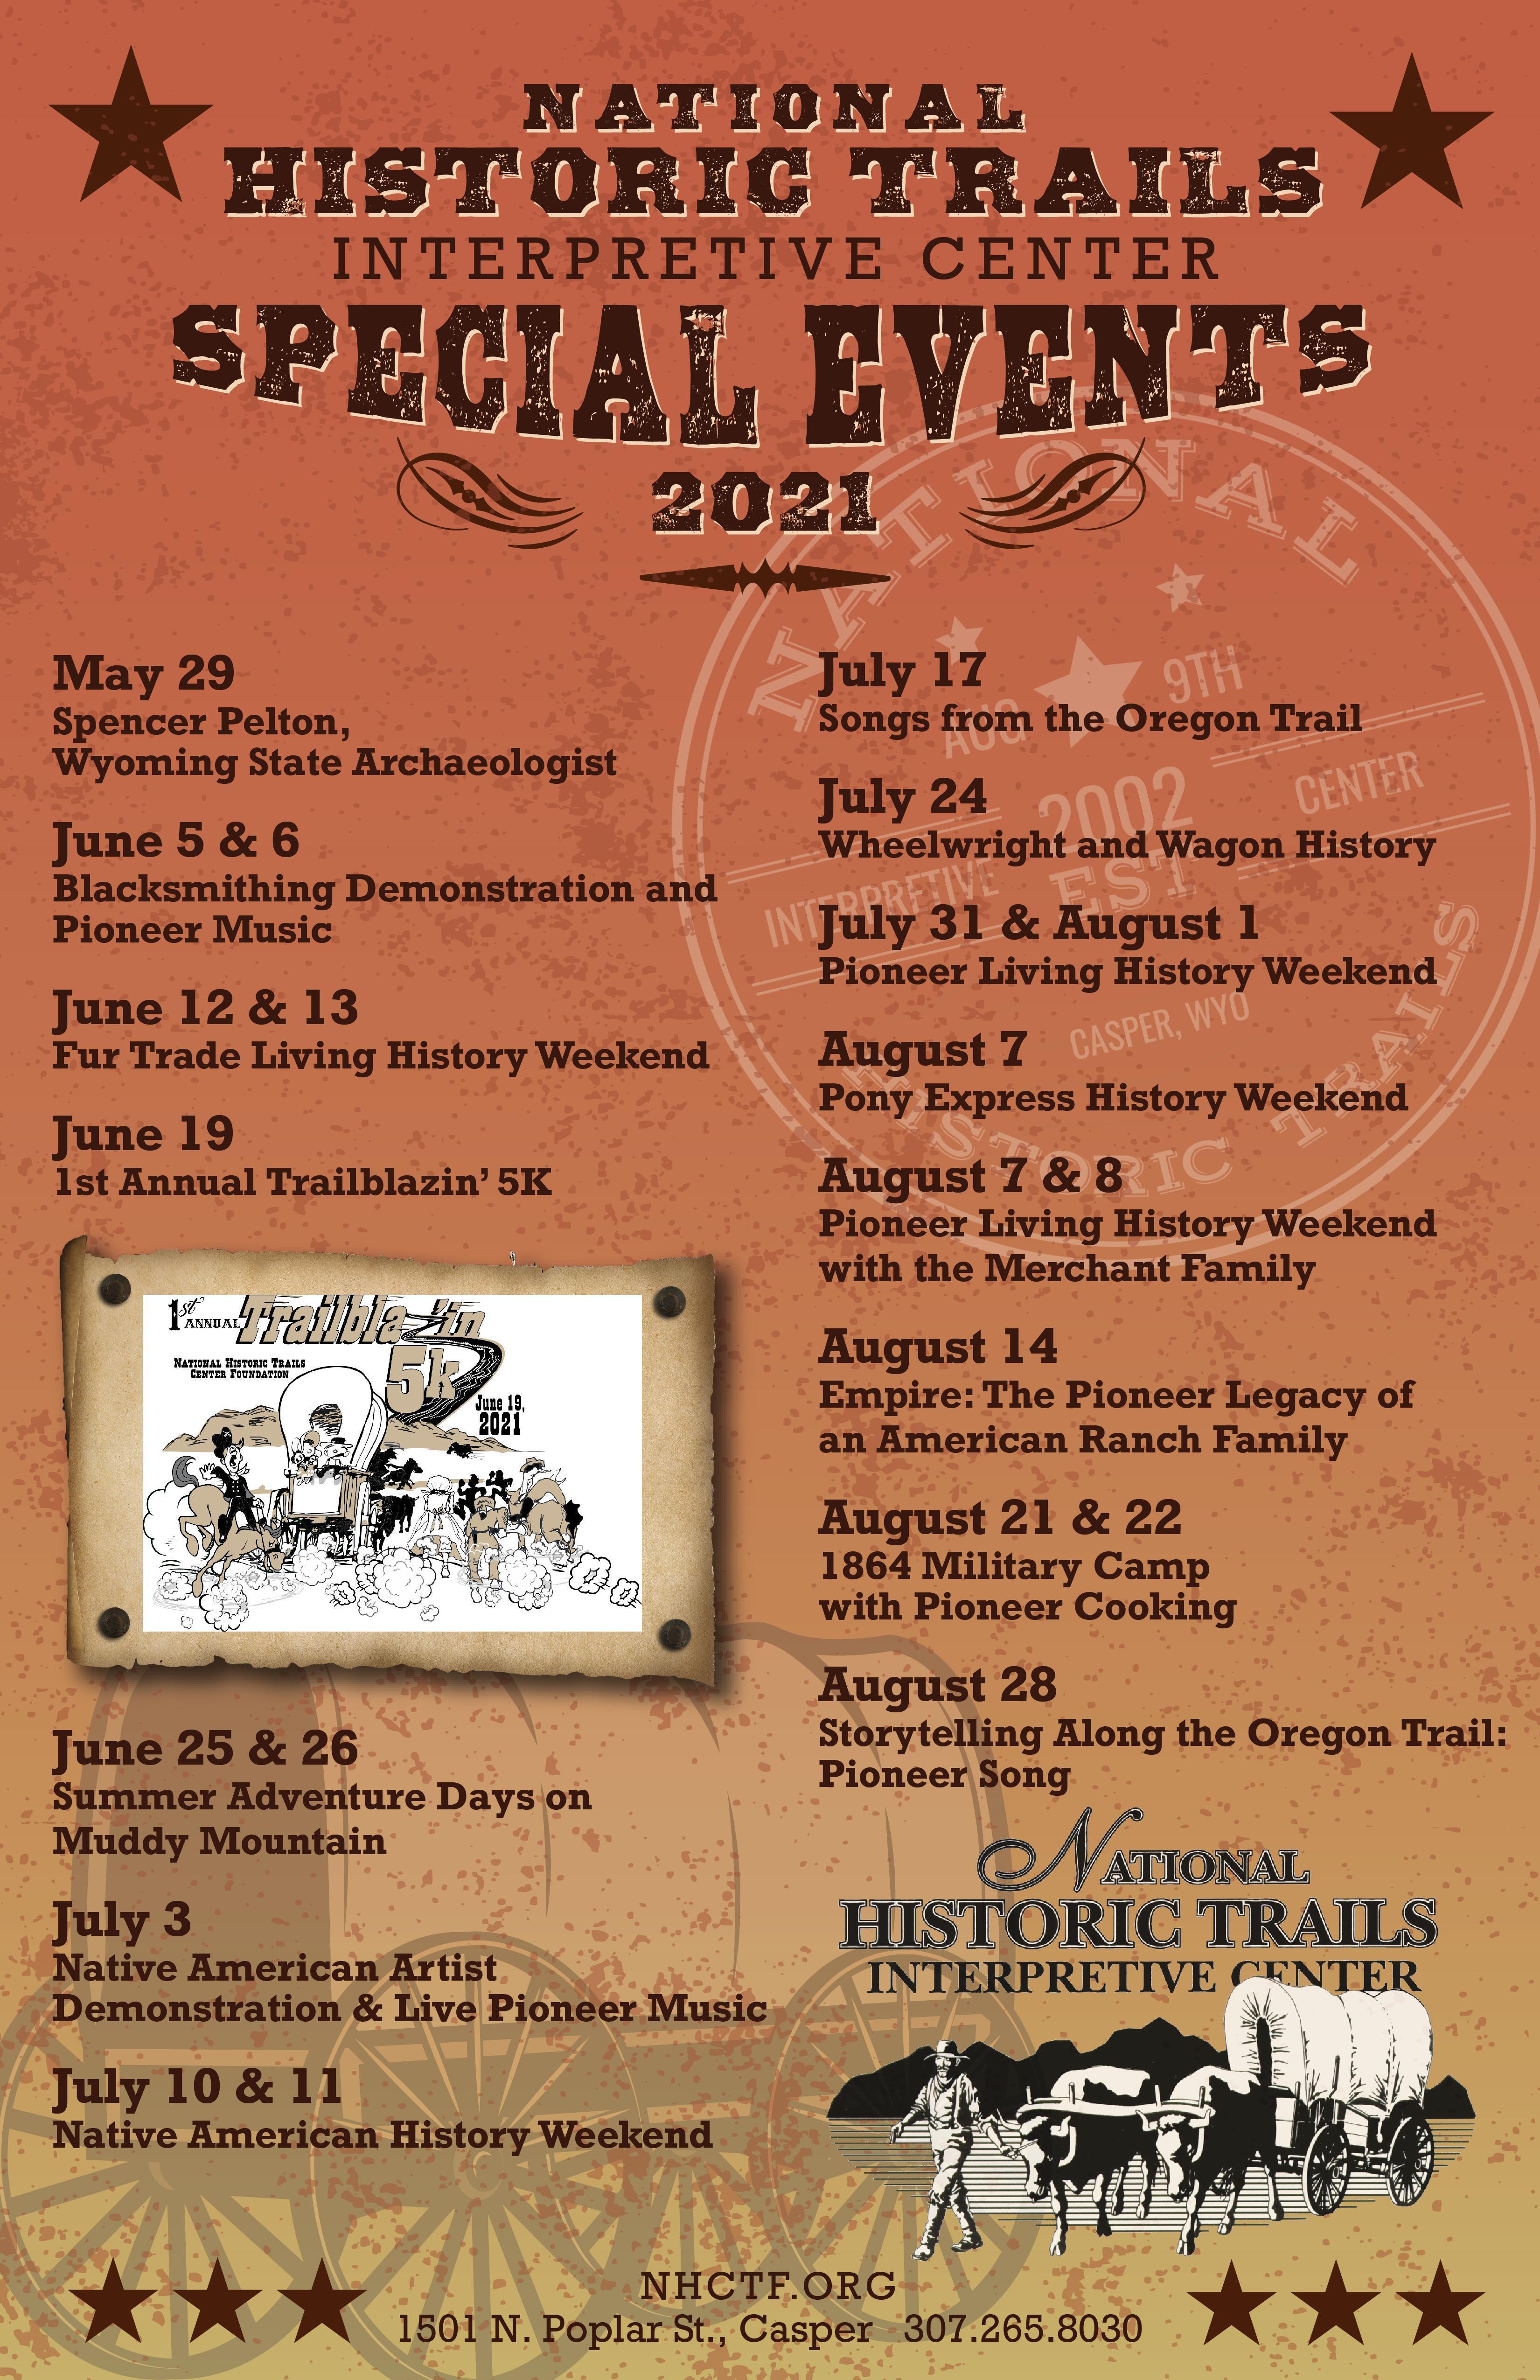 National Historic Trails Interpretive Center Special Events flyer